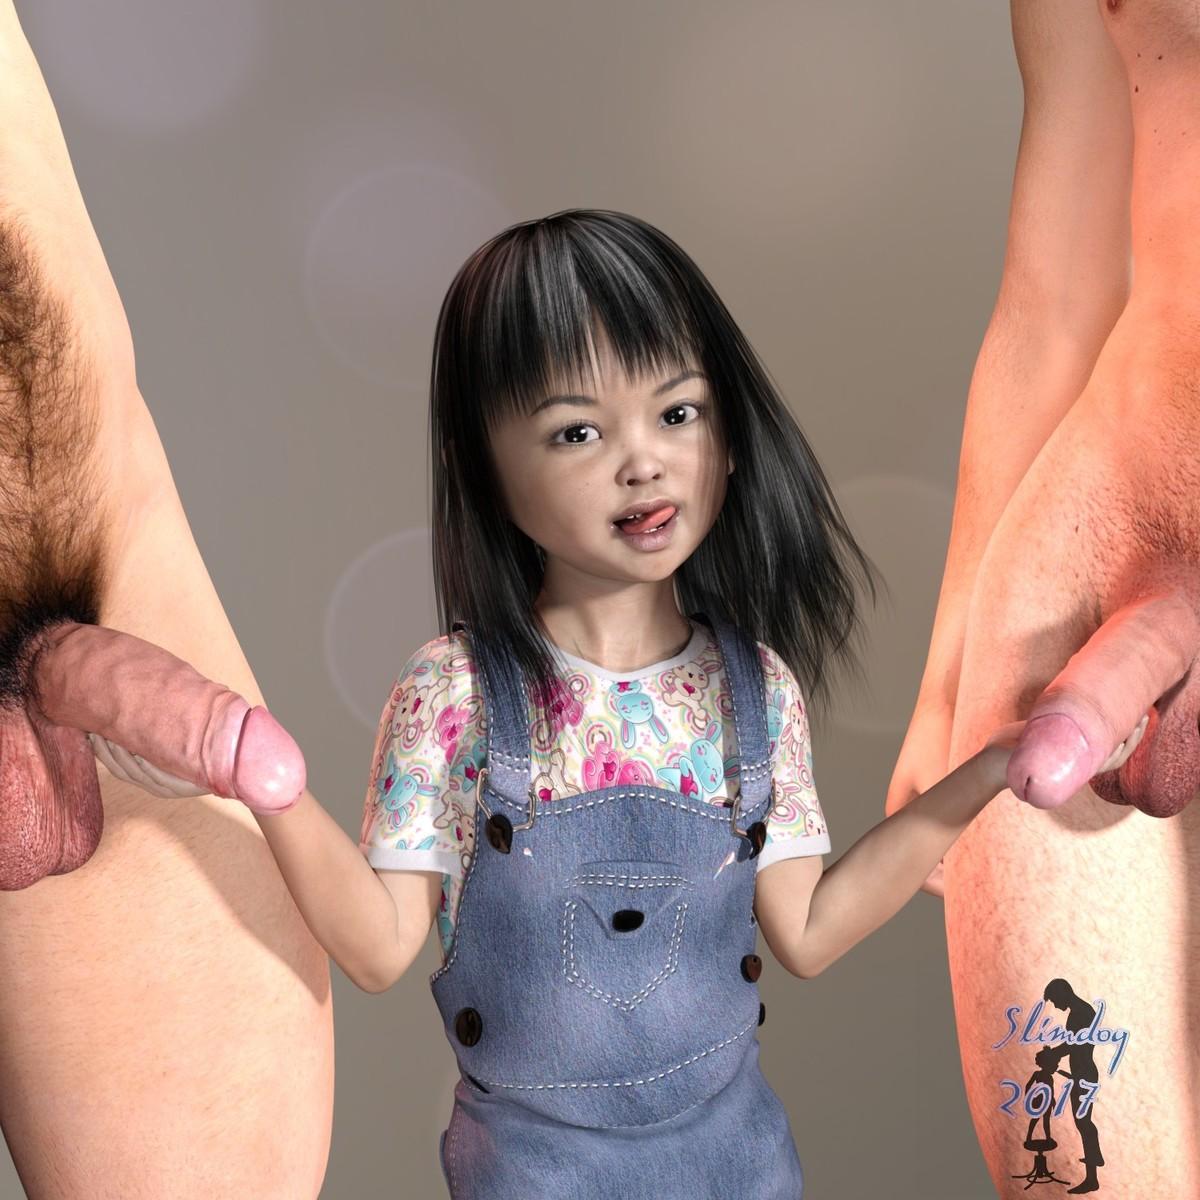 Toddlercon 3d Hentai Girl | Photo Sexy Girls